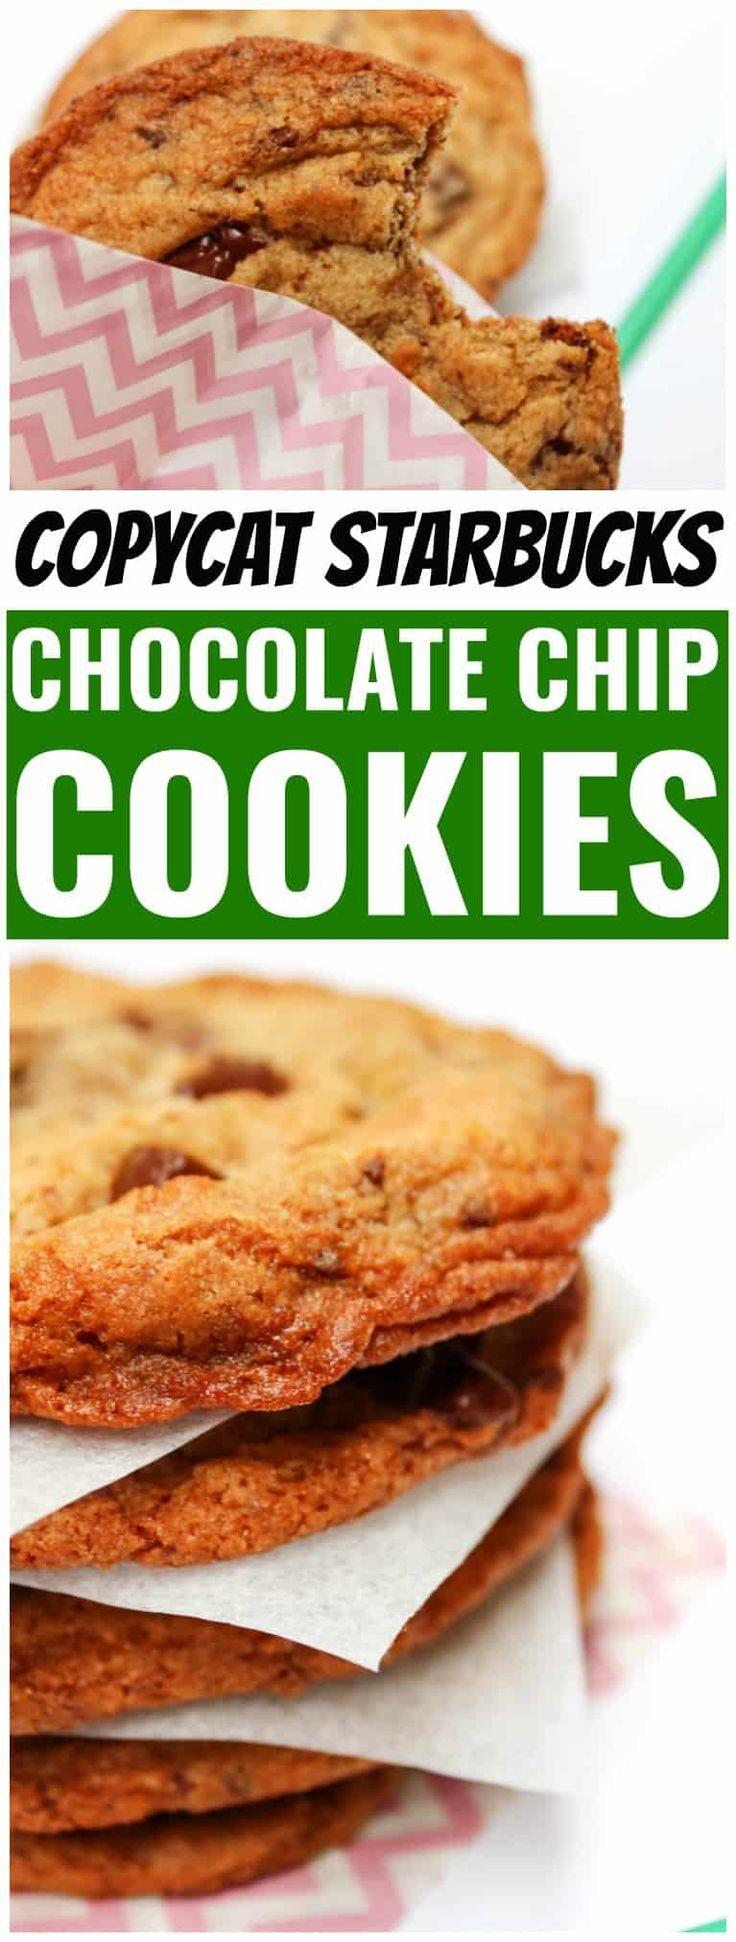 COPYCAT STARBUCKS CHOCOLATE CHOCOLATE CHIP COOKIES - Classic chocolate chip cookies with crisp buttery edges, chewy center and dark chocolate chips. #copycatrecipe #starbucks #dessert #chocolatechipcookies #cookie